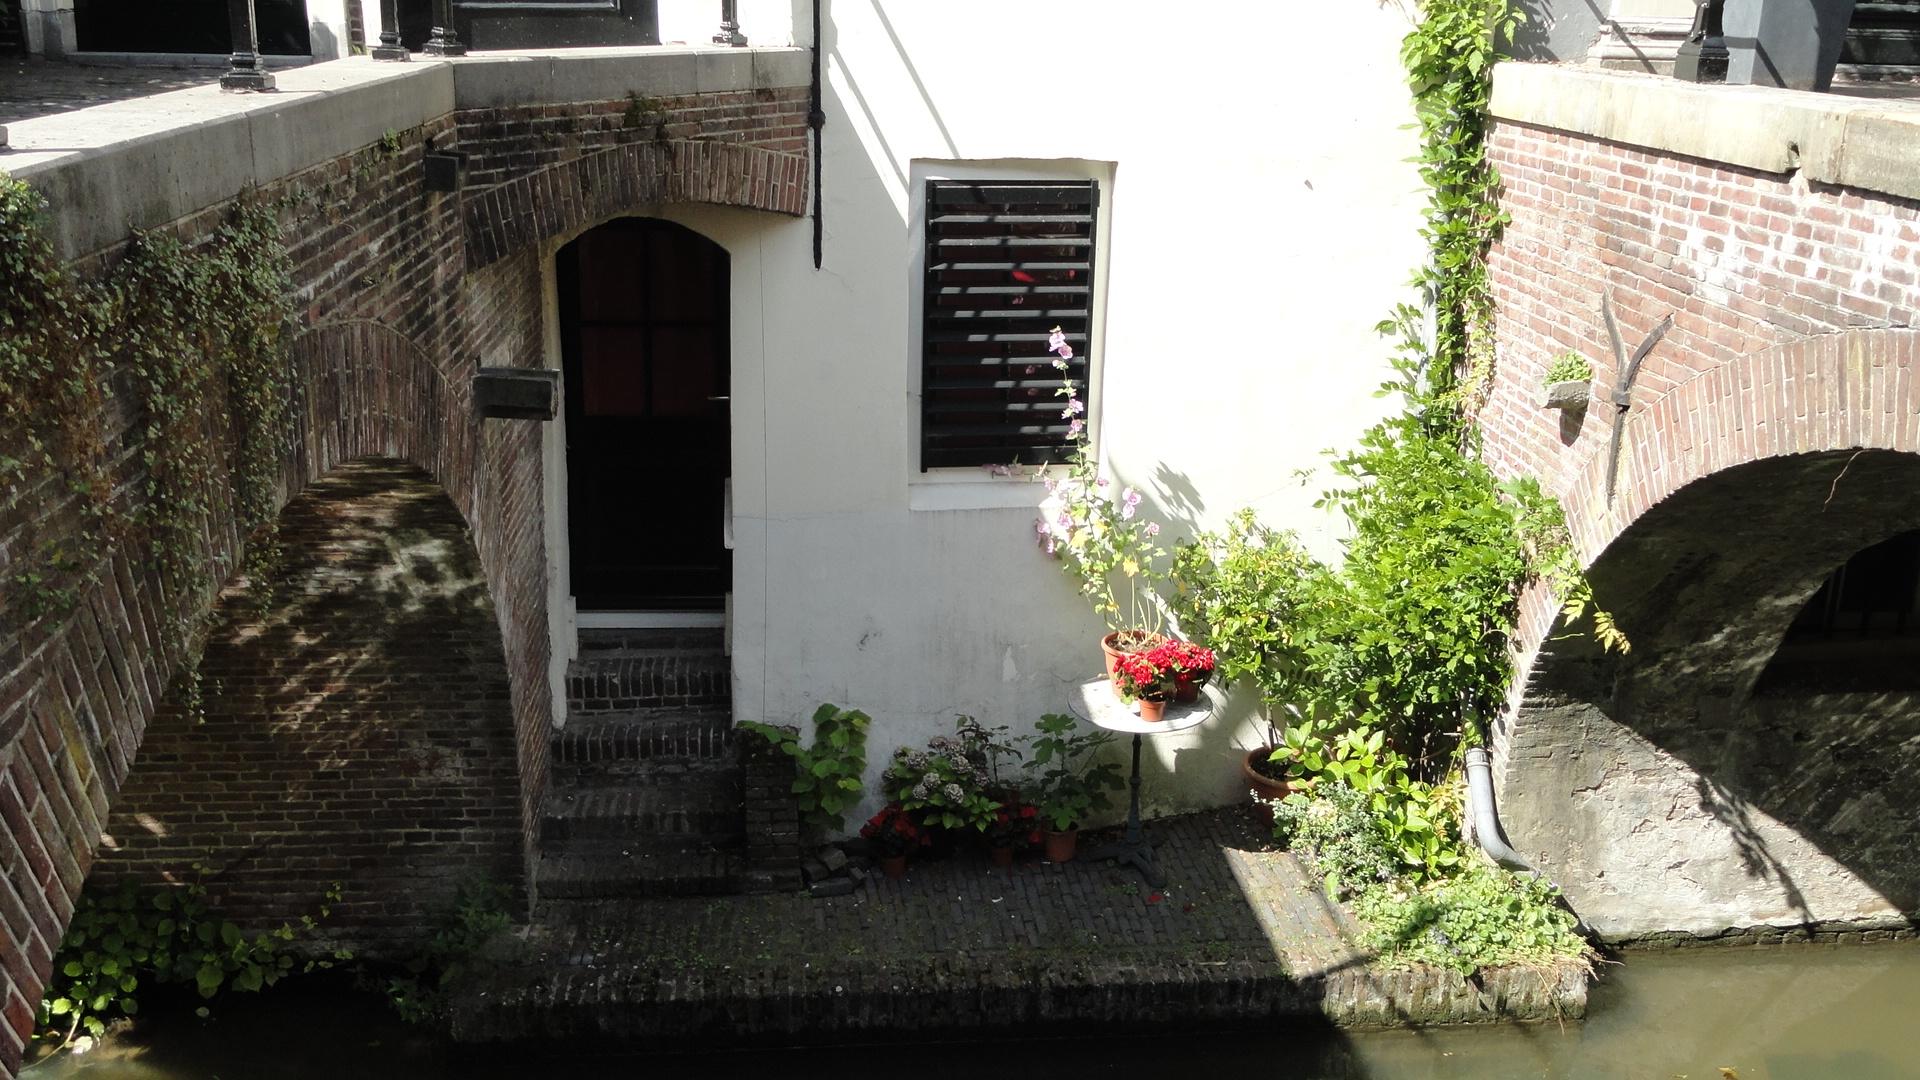 Utrecht - Terrasse privée au bord du Nieuwegracht